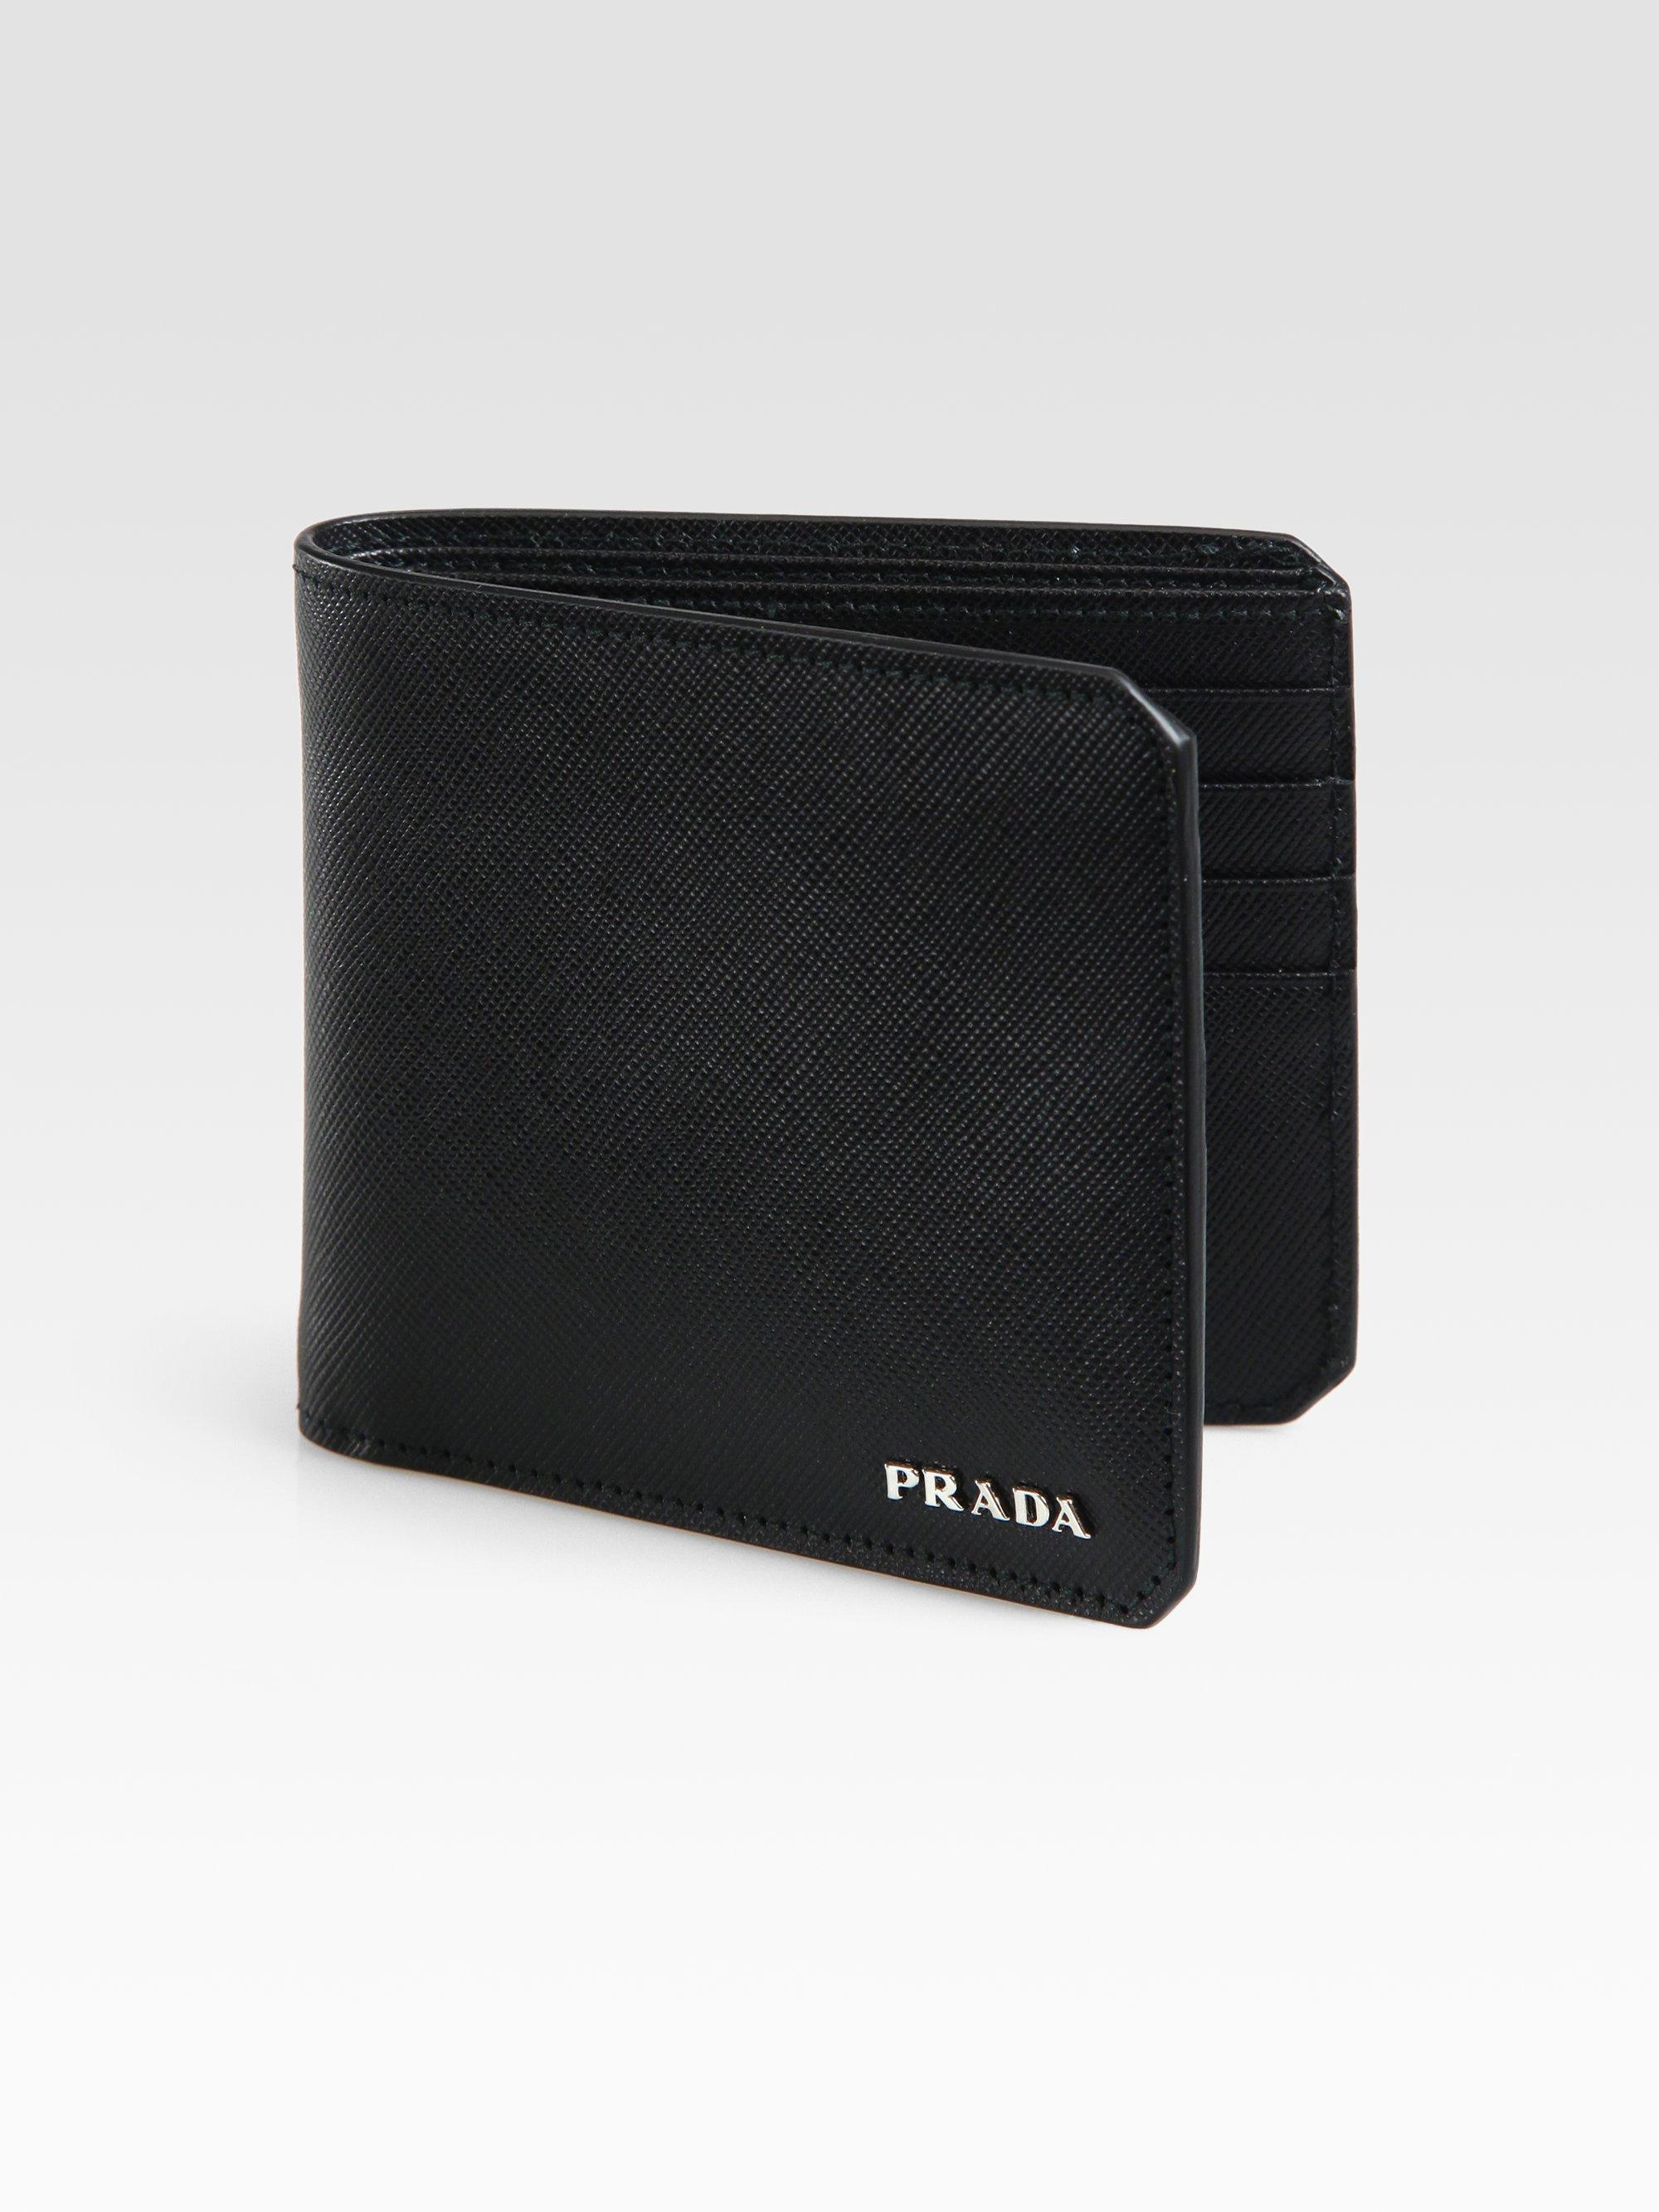 prada nylon clutch - Prada Saffiano Leather Wallet in Black for Men | Lyst